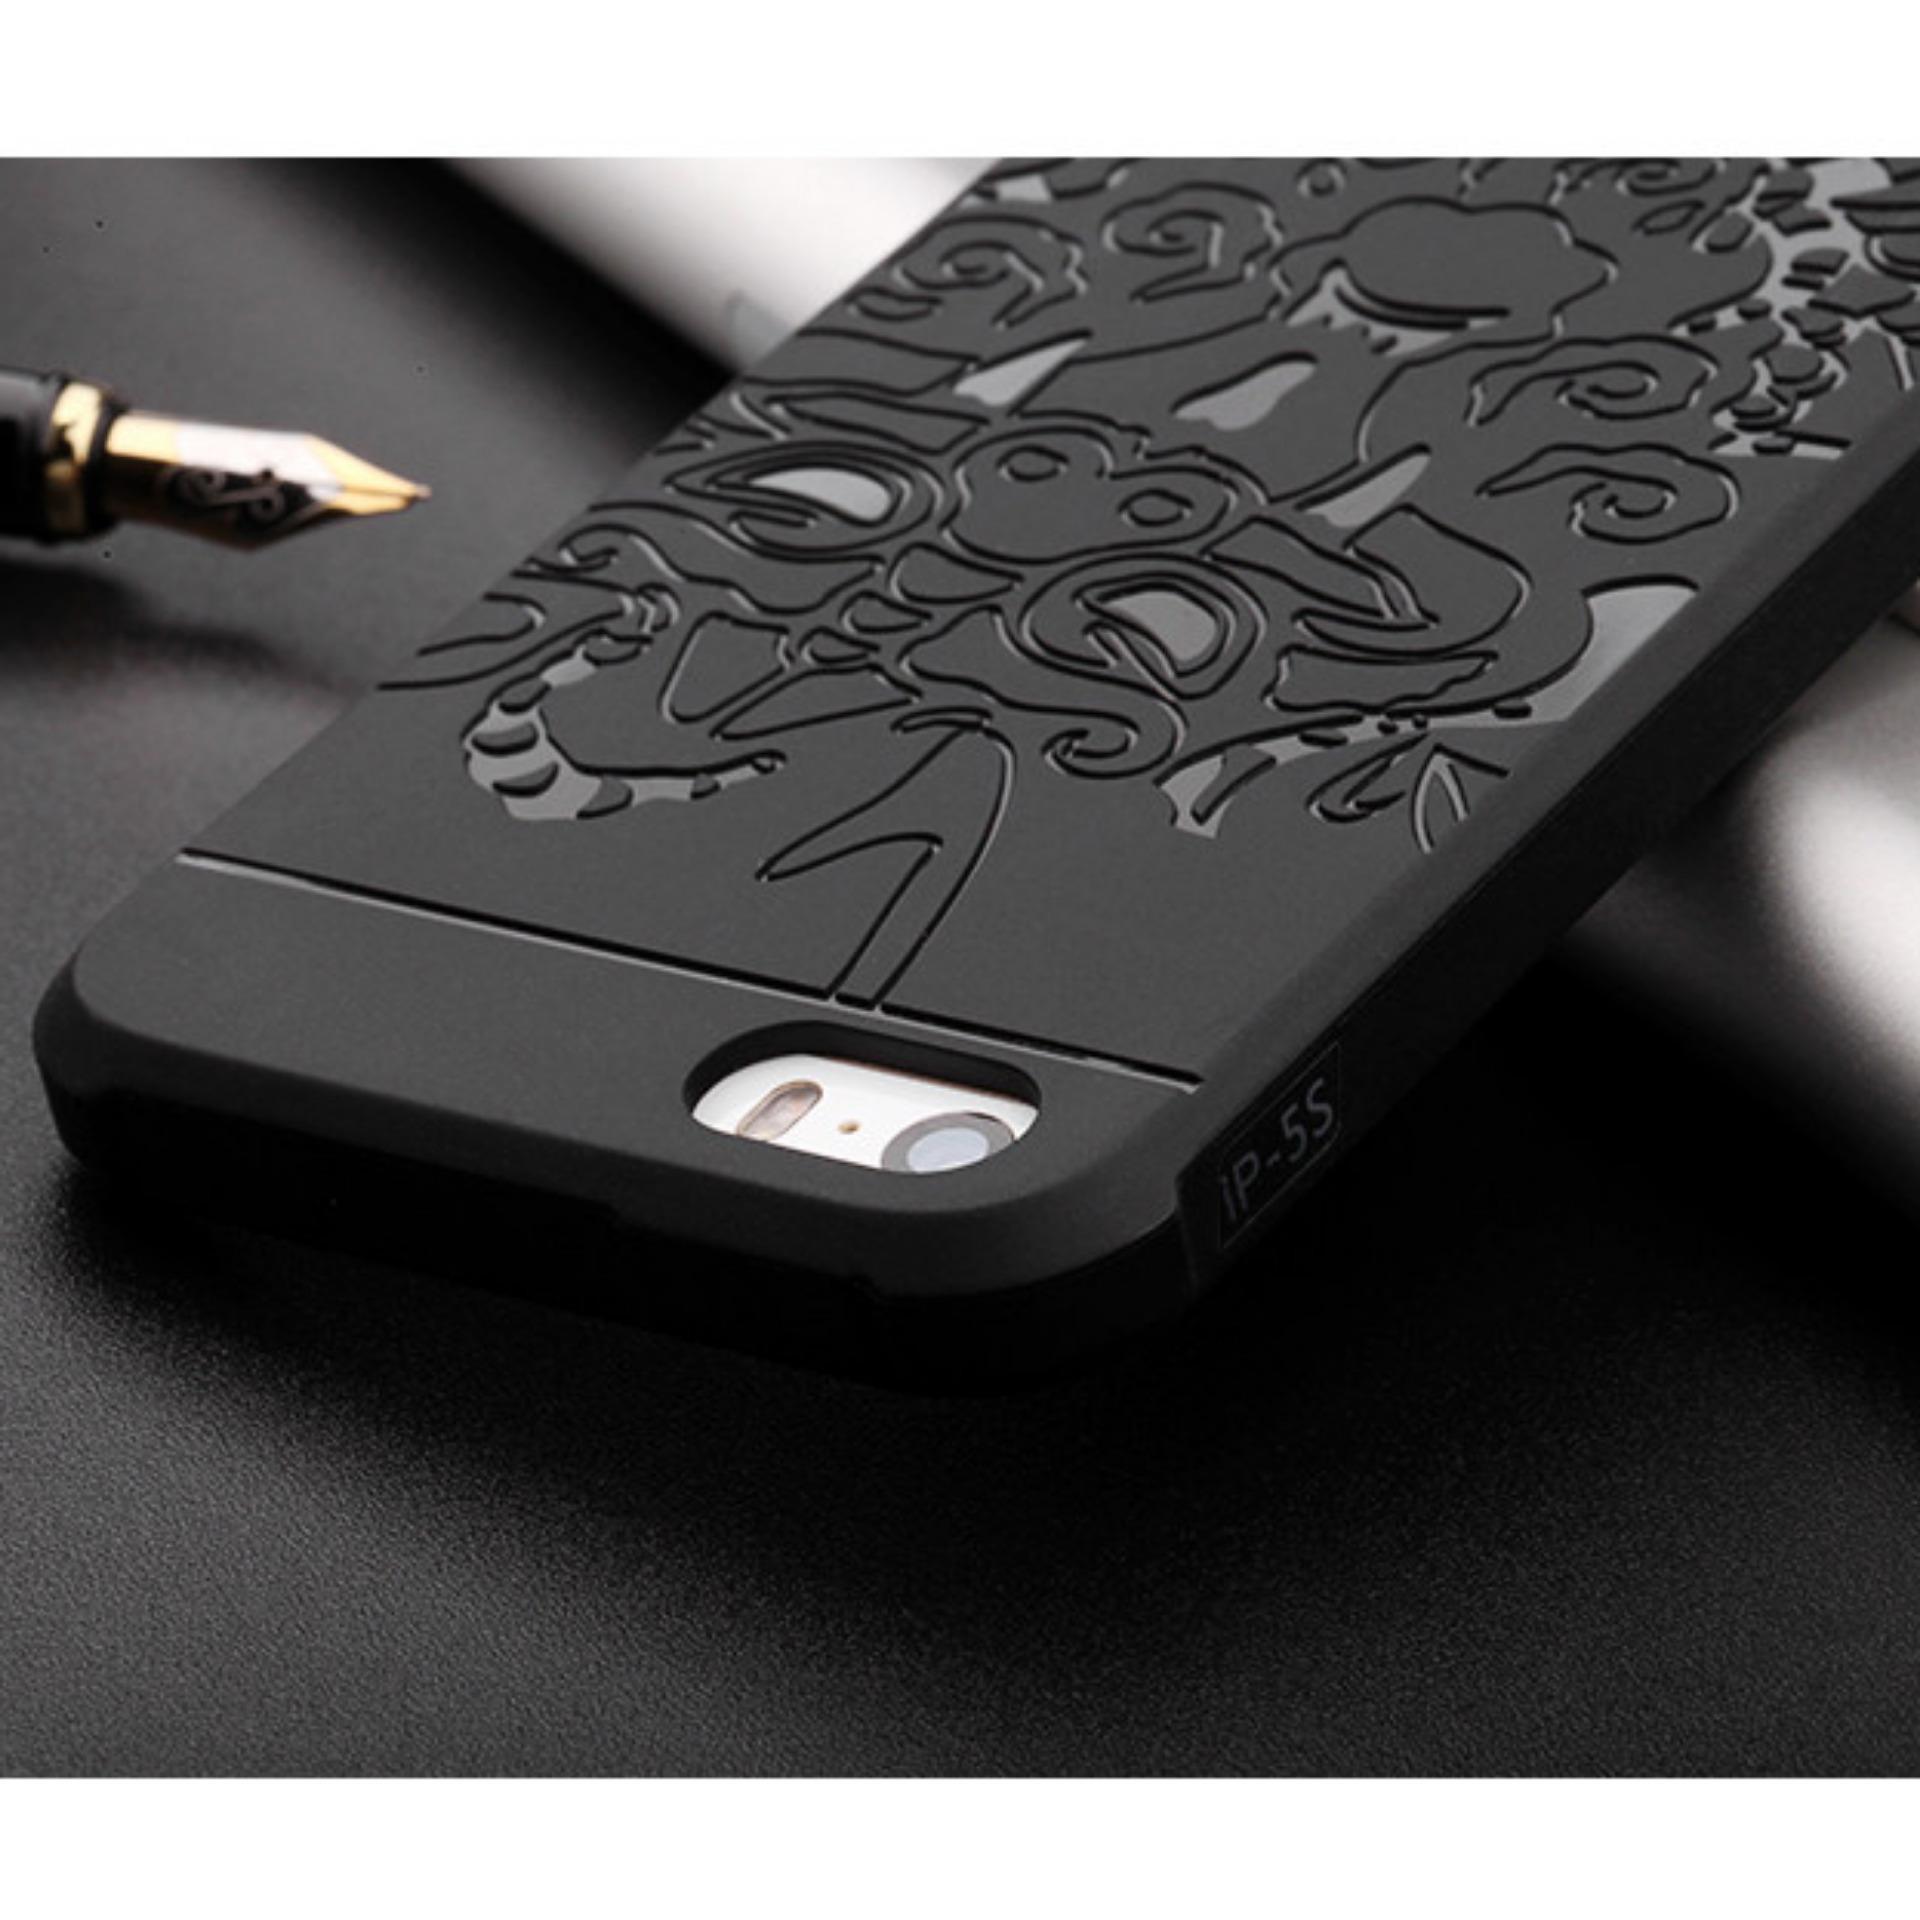 Case TPU Dragon Back Cover Silikon Original for Apple iPhone 5 / 5s .